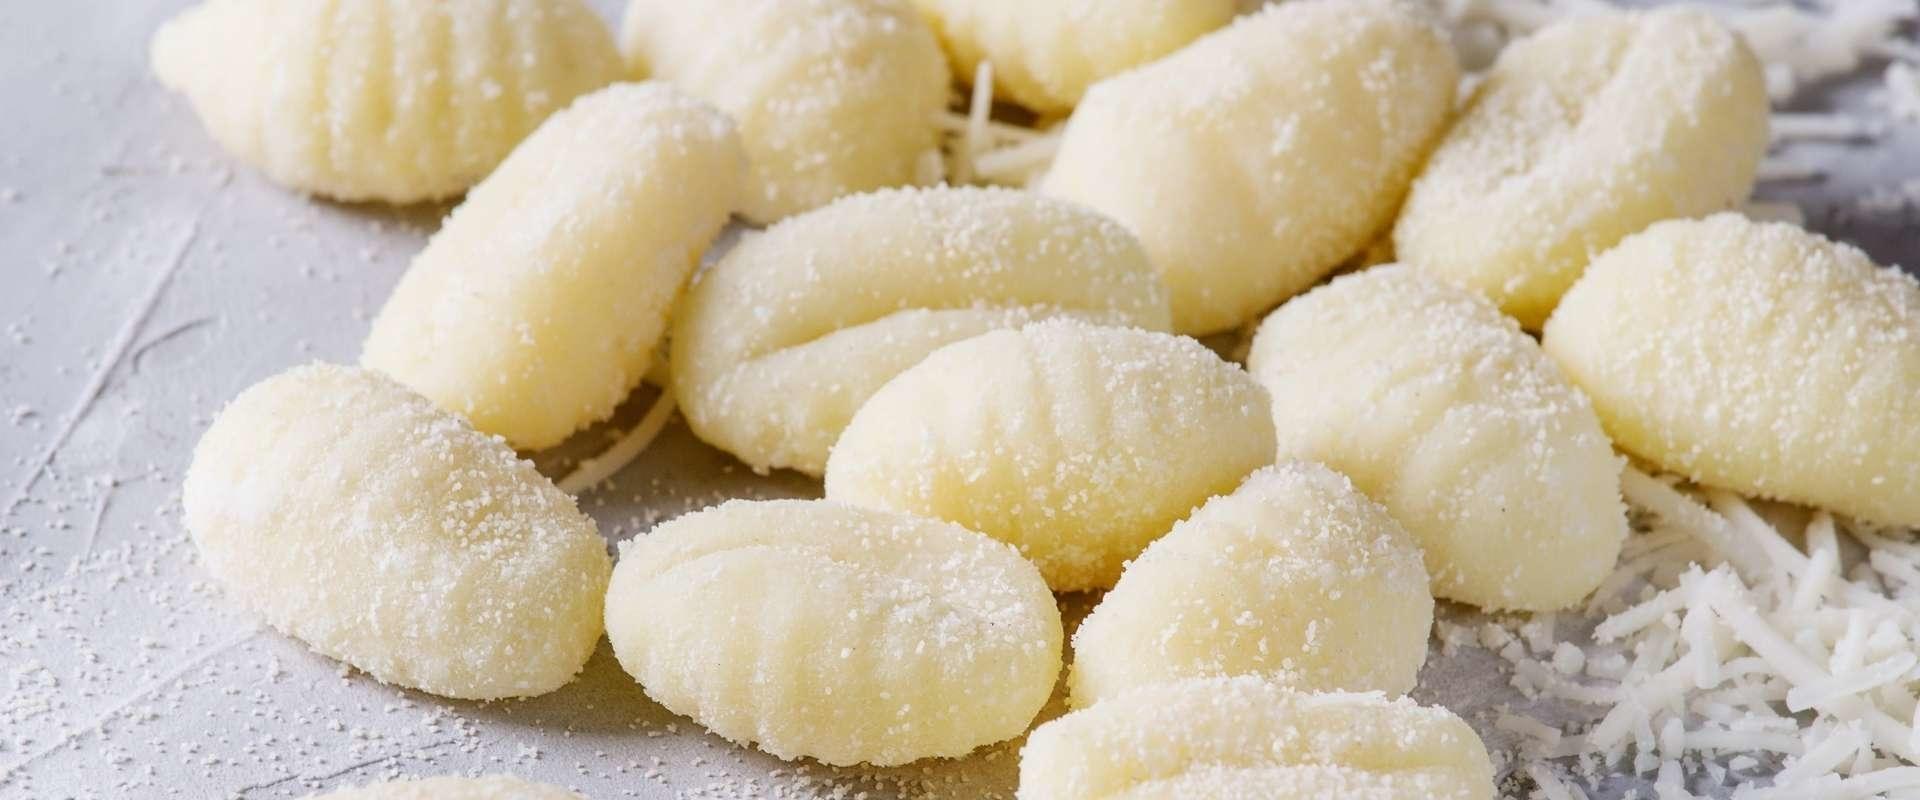 Hoe maak je gnocchi?